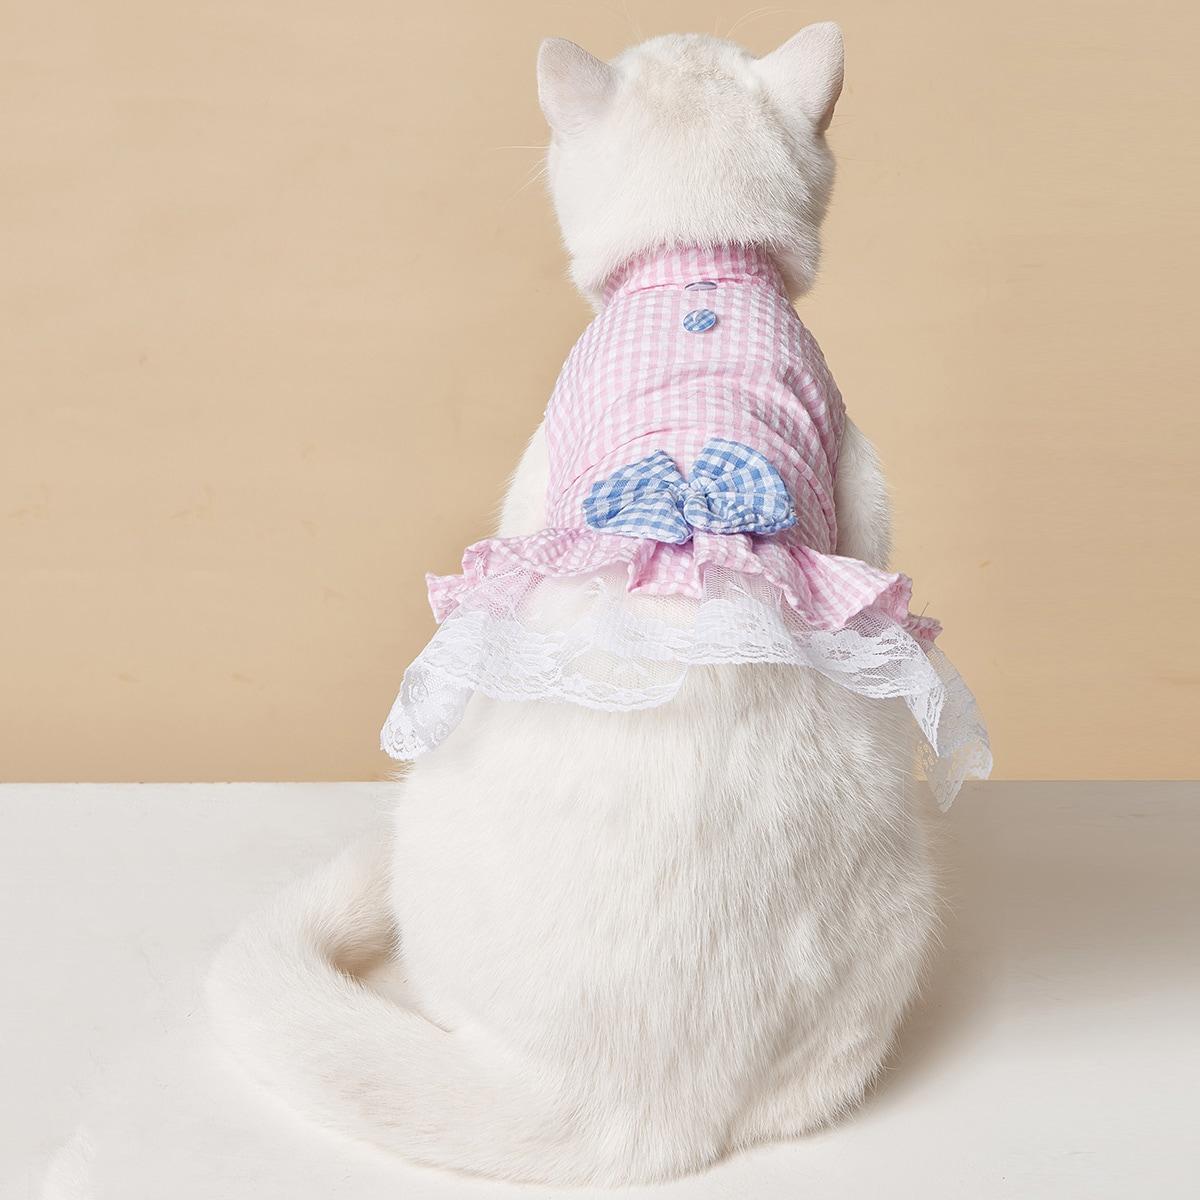 Bow Decor Plaid Pet Dress